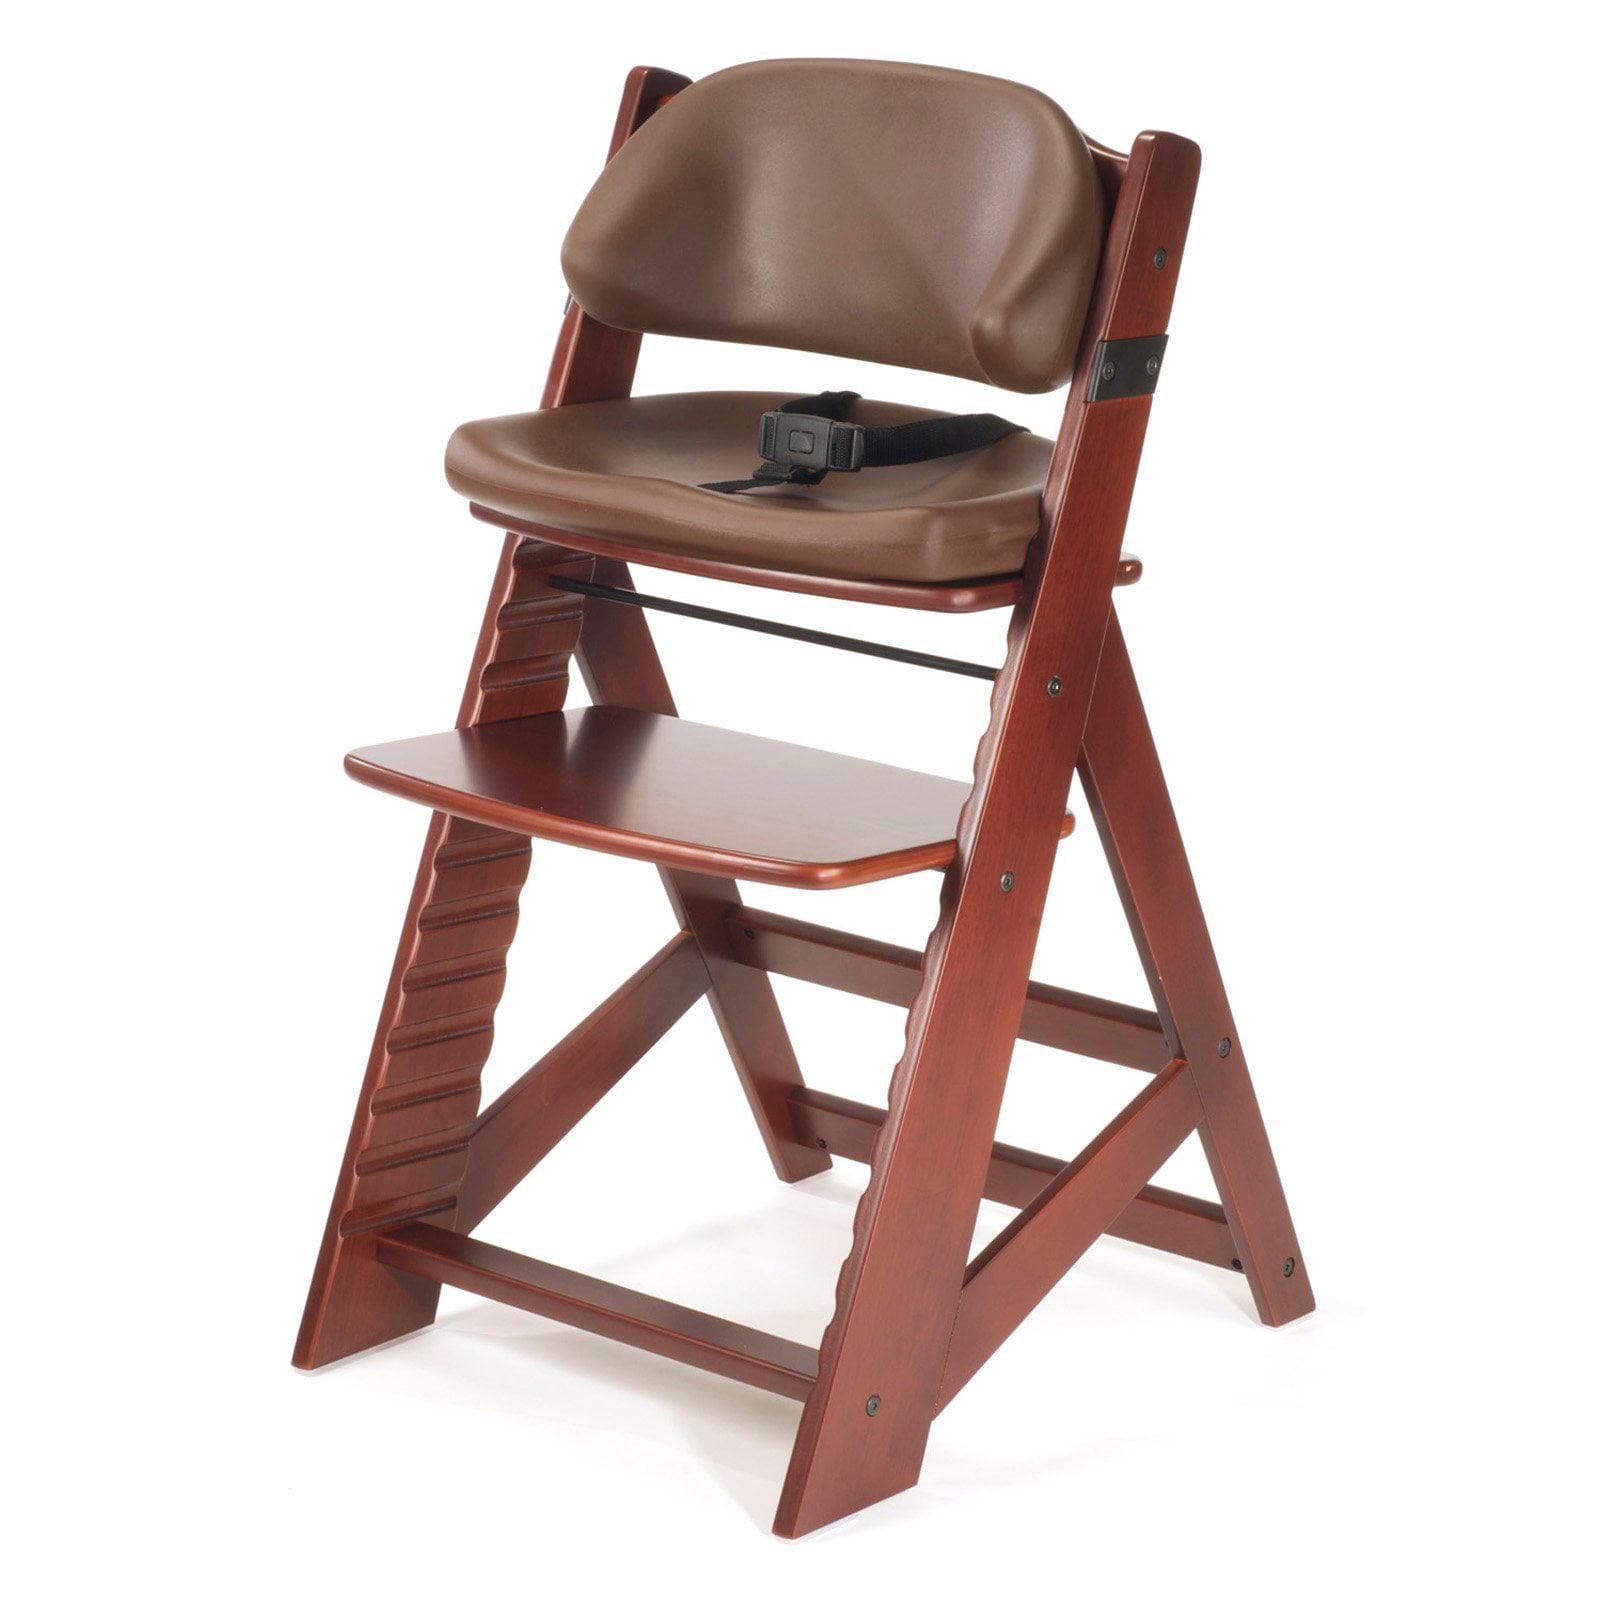 Keekaroo Height Right Kids Chair Mahogany with Chocolate Comfort Cushions